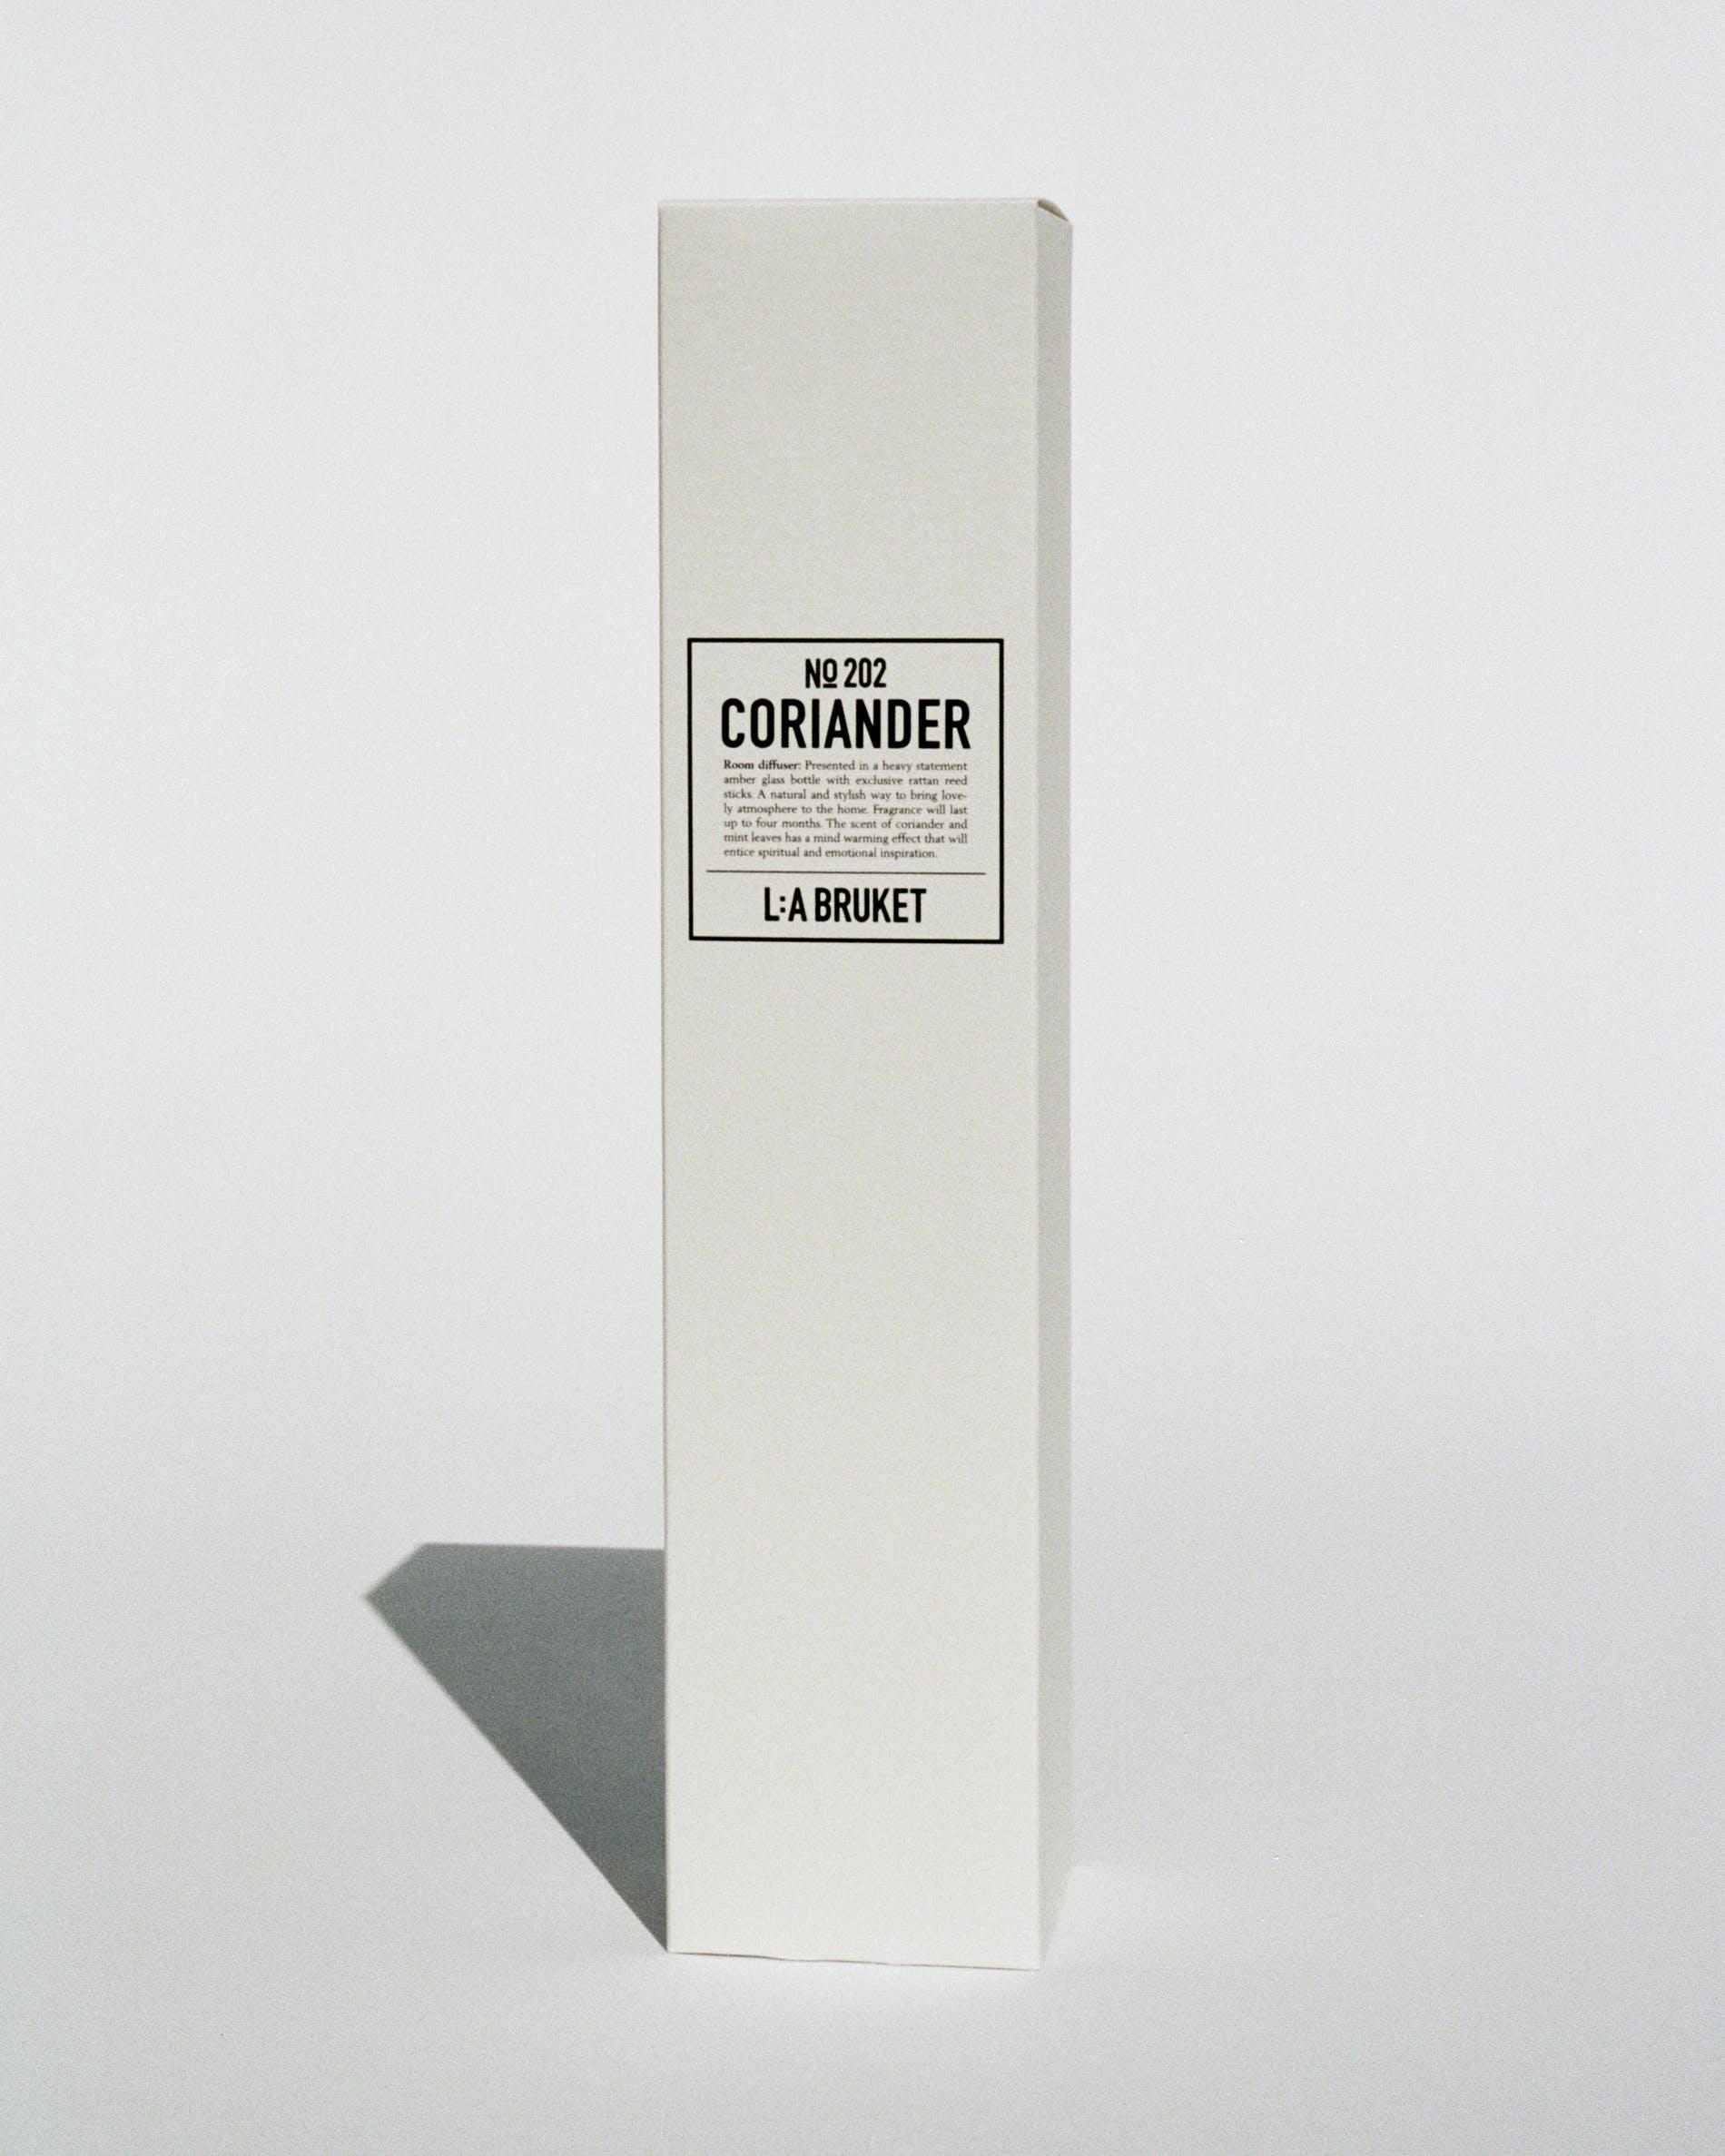 OhMart L:A Bruket 202 Room Diffuser ( Coriander ) 4